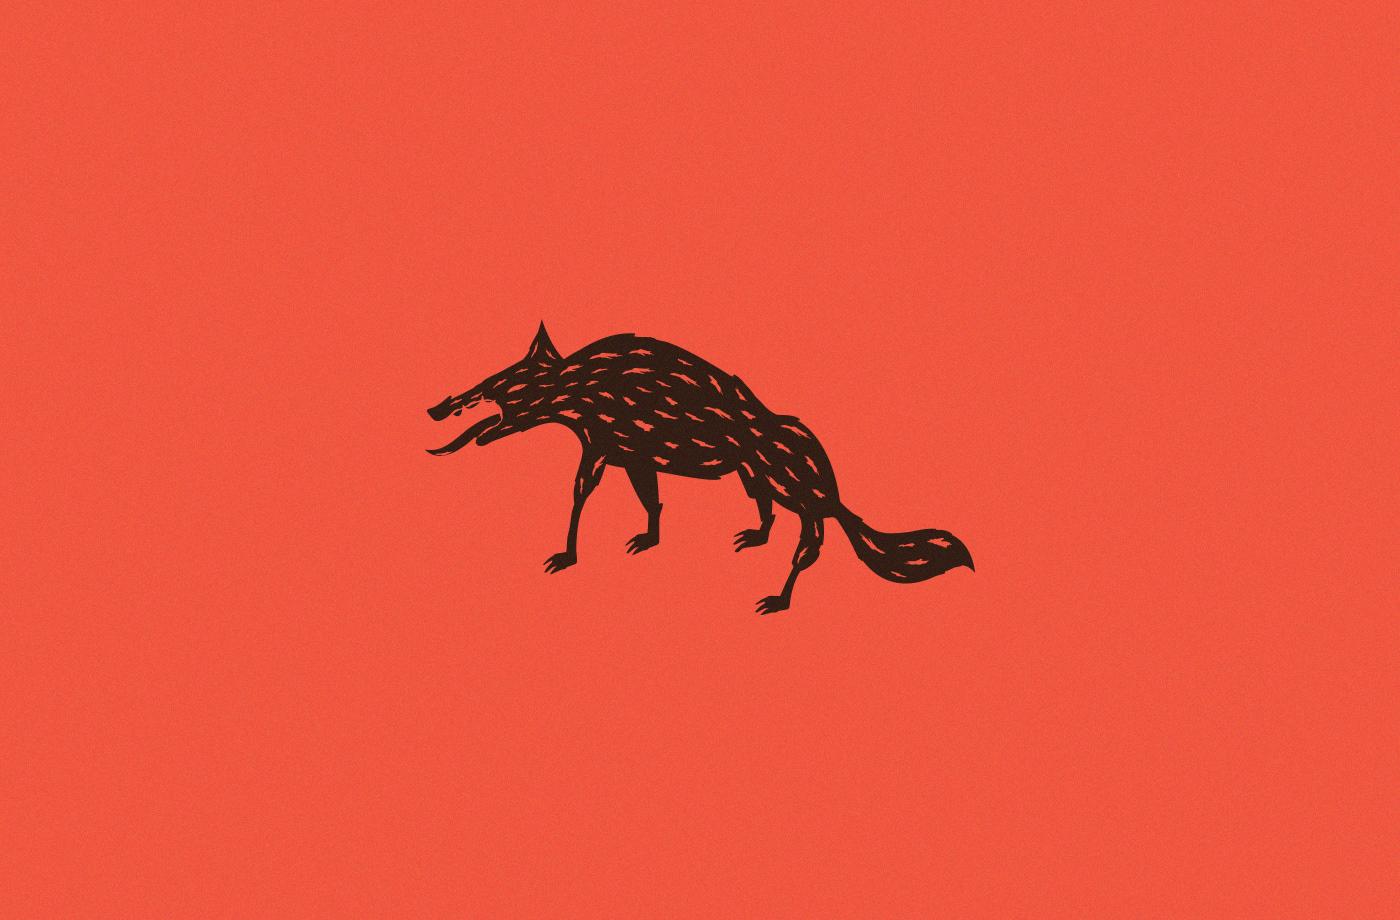 wolf,beer,bar,monterrey,branding ,cerveceria,texture,circle,Dynamic